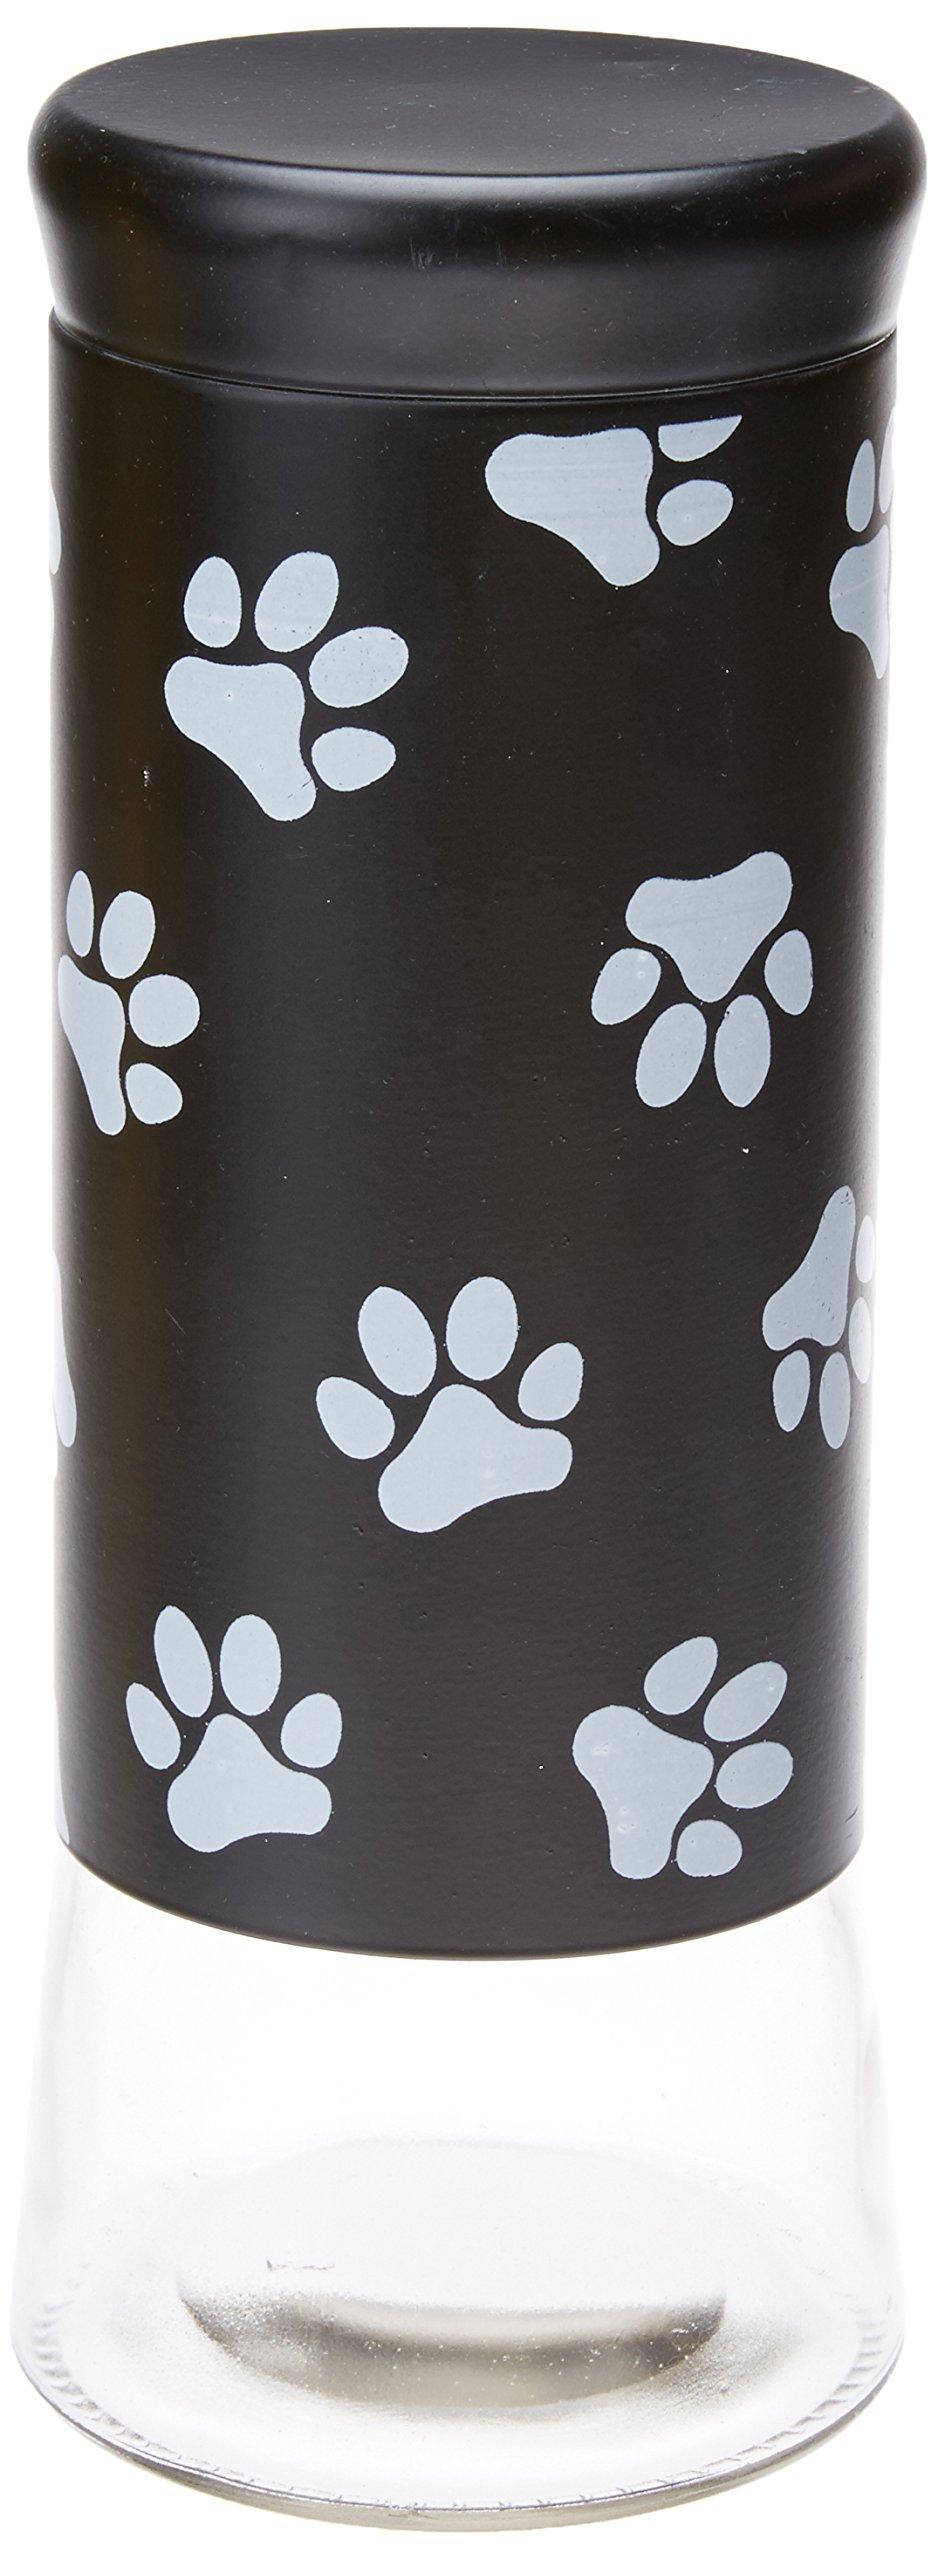 Housewares International 11-1/2-Inch Glass Pet Treats and Snacks Storage Jar, Black Background